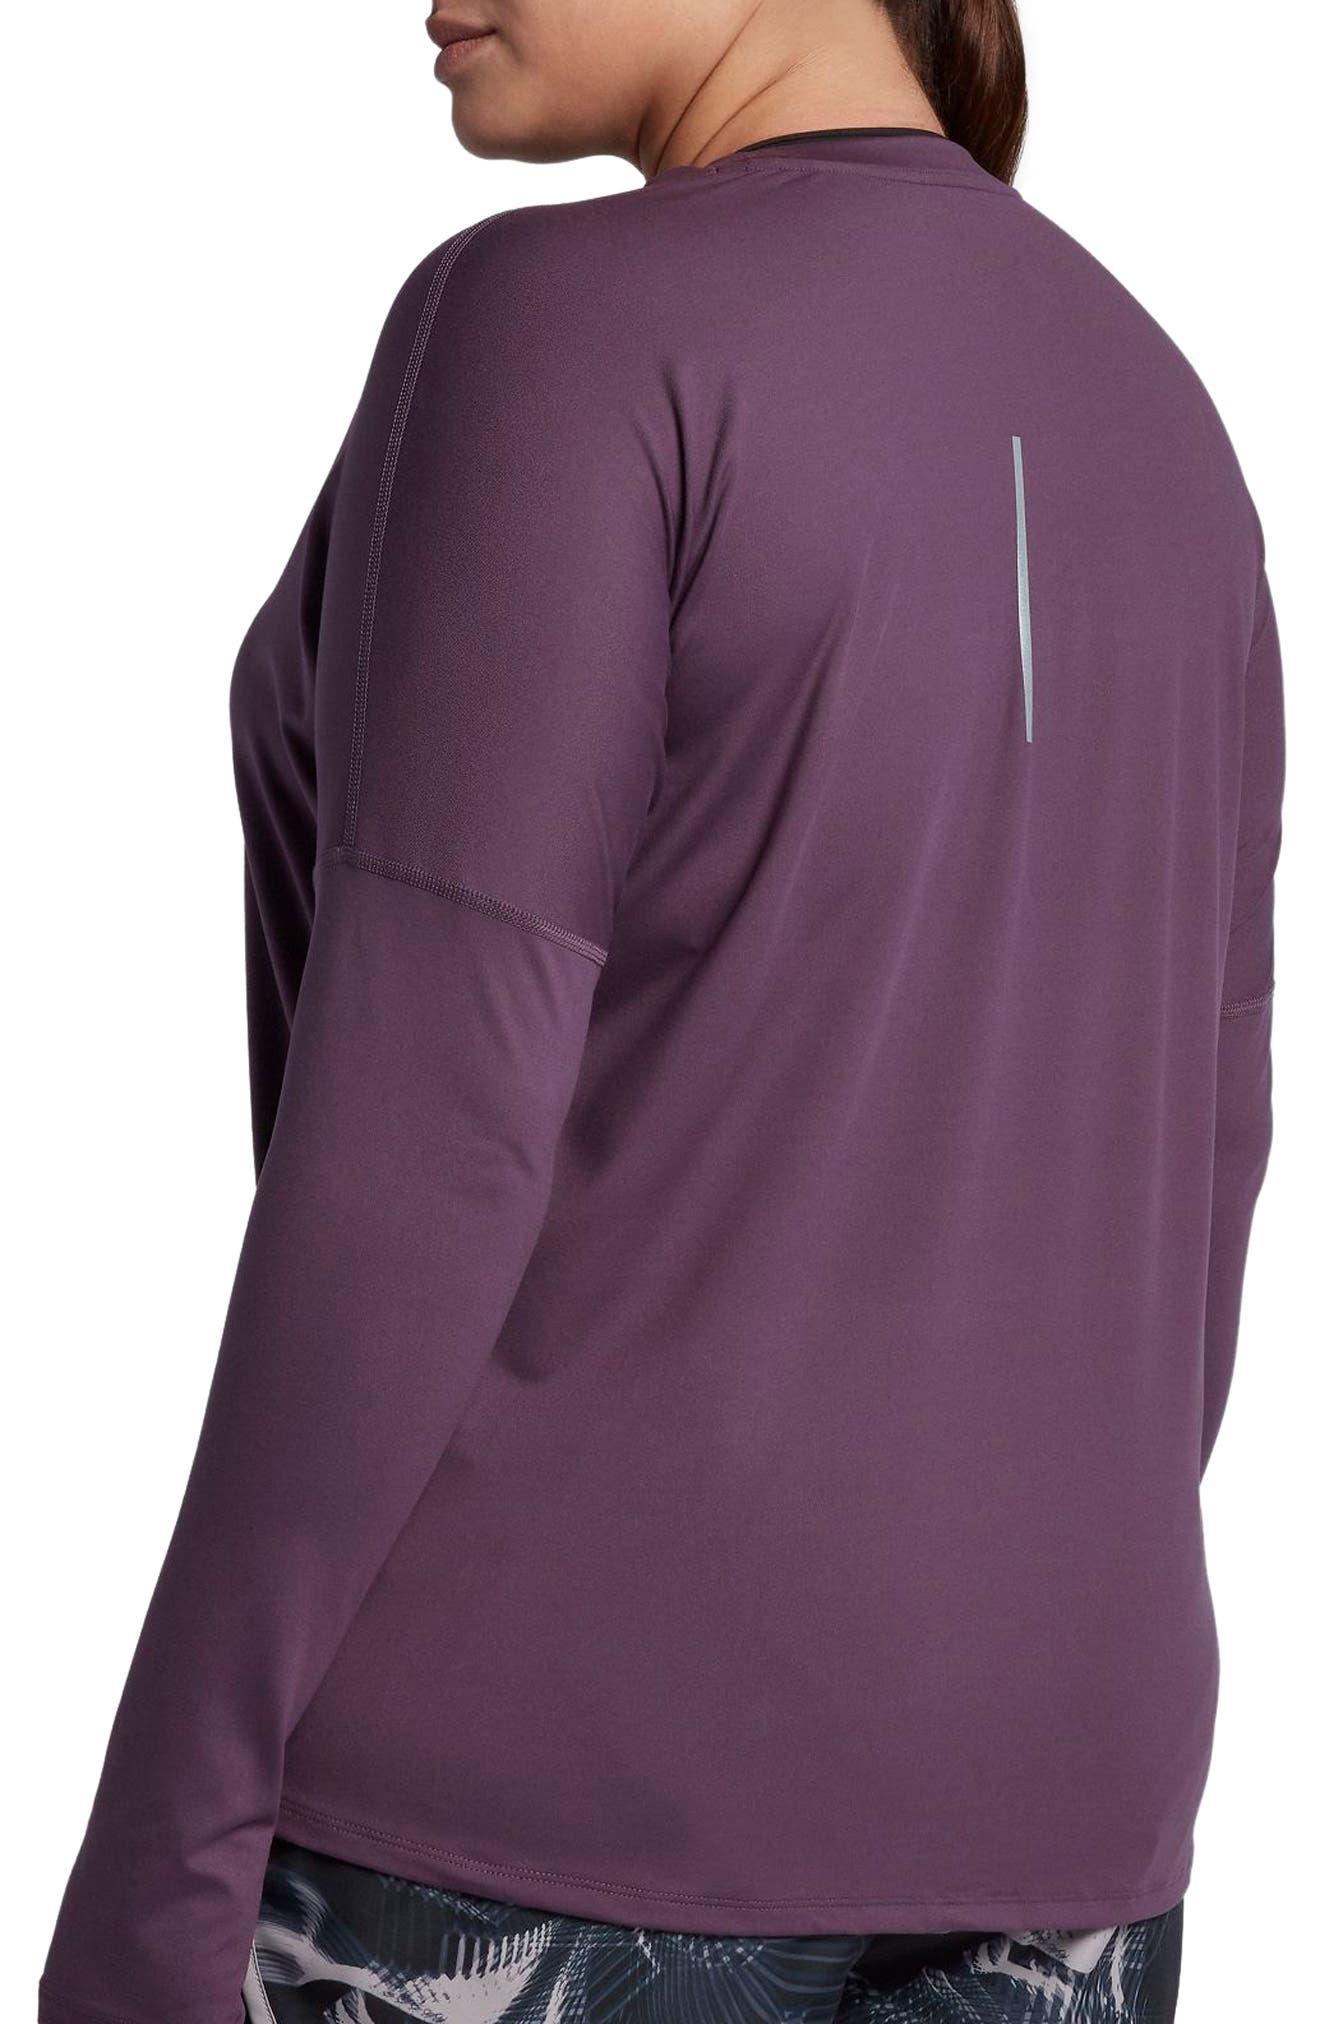 Dry Element Long Sleeve Top,                             Alternate thumbnail 6, color,